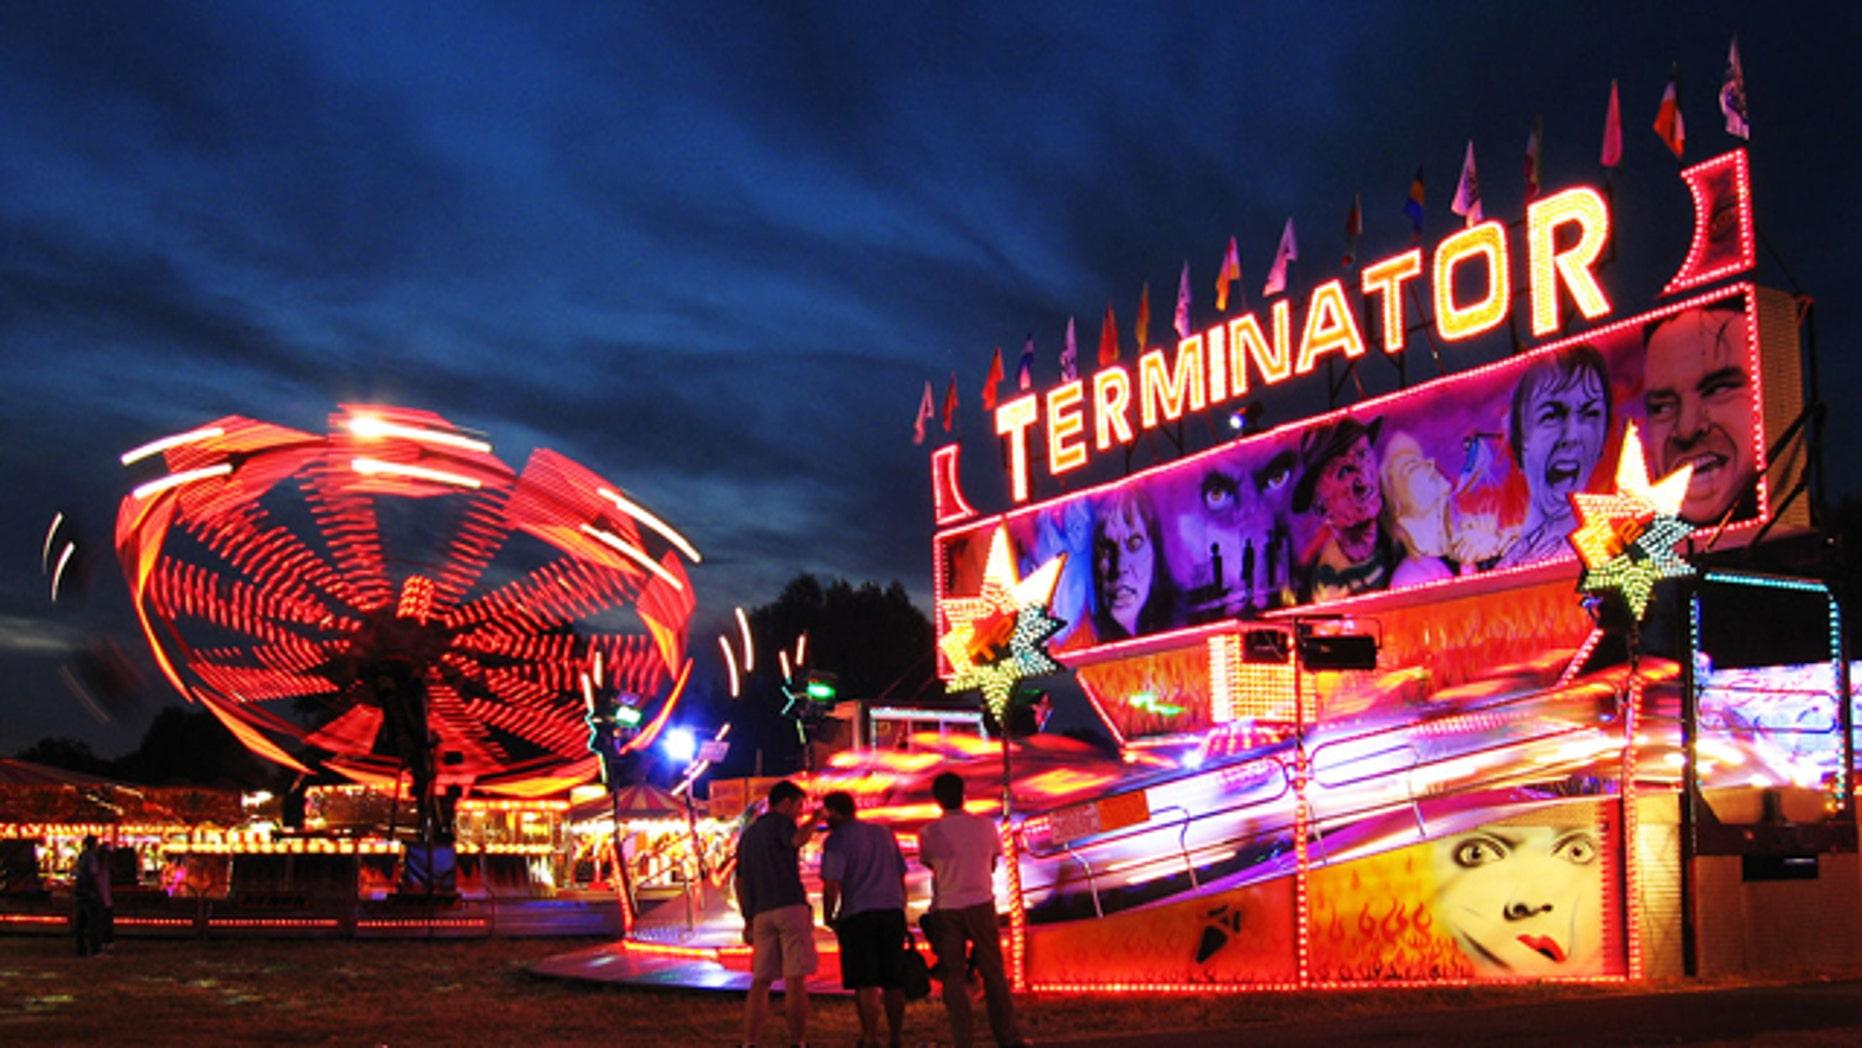 Rides glow at night at the Cambridge Midsummer Fair amusement park.